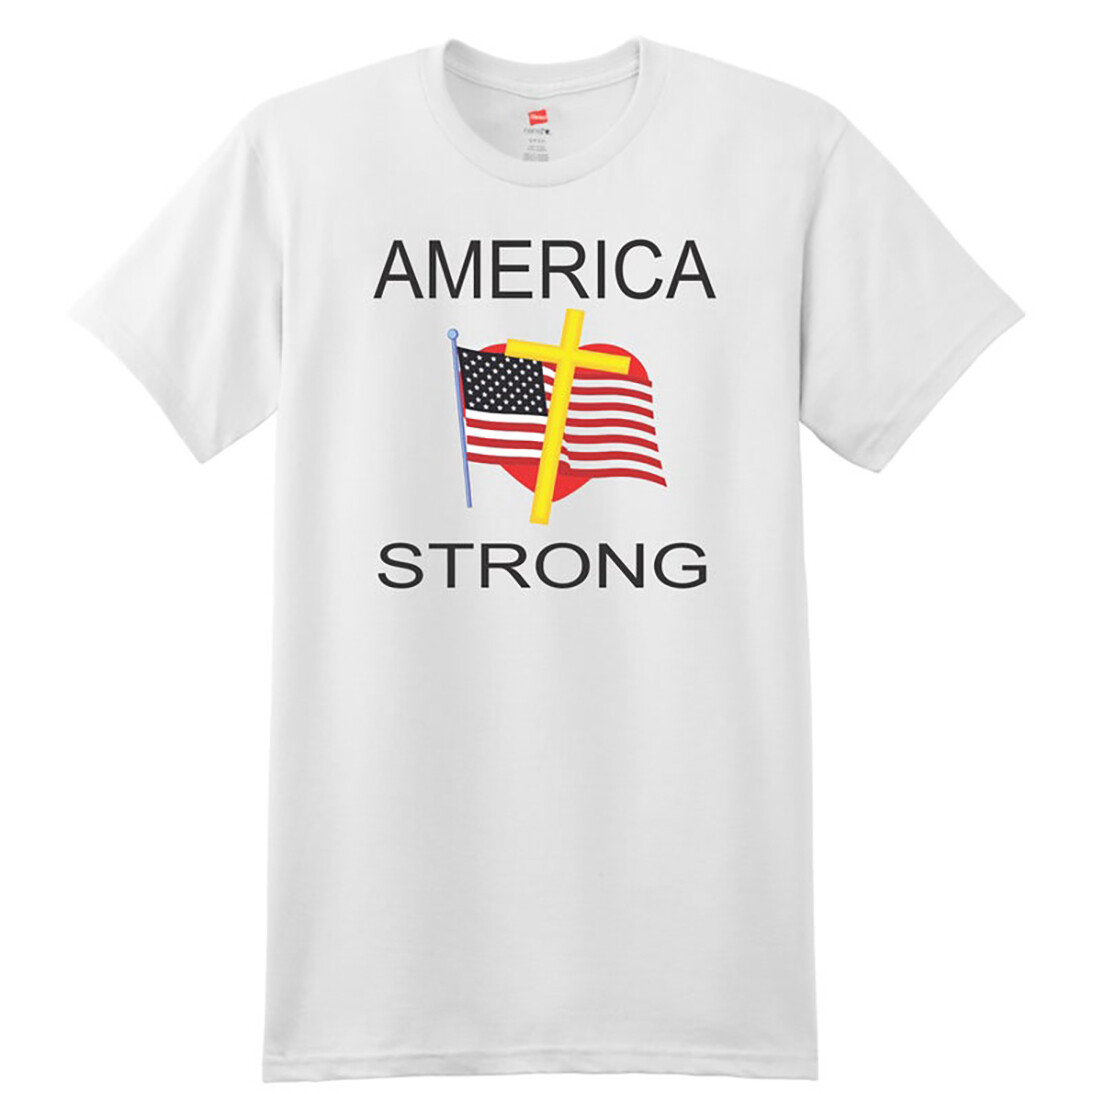 America strong shirt